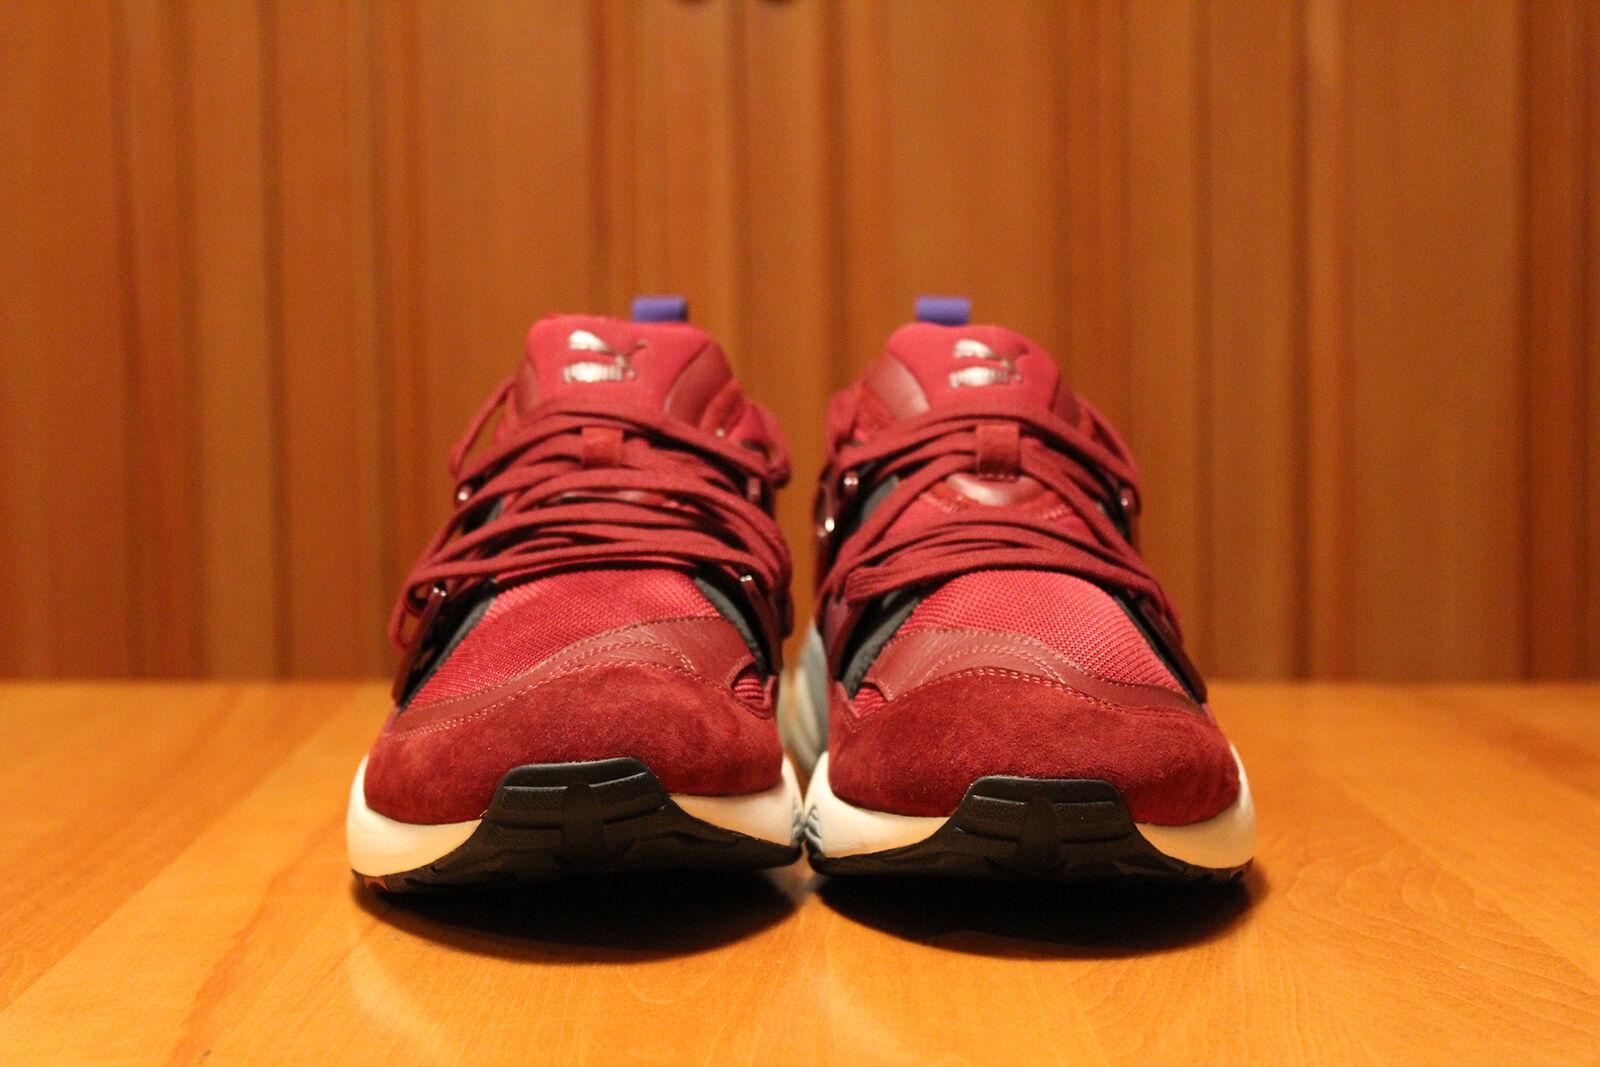 Puma Puma Puma Blaze of Glory Uomo scarpe Cordovan bianca Dimensione 11 New Running 8c0a61